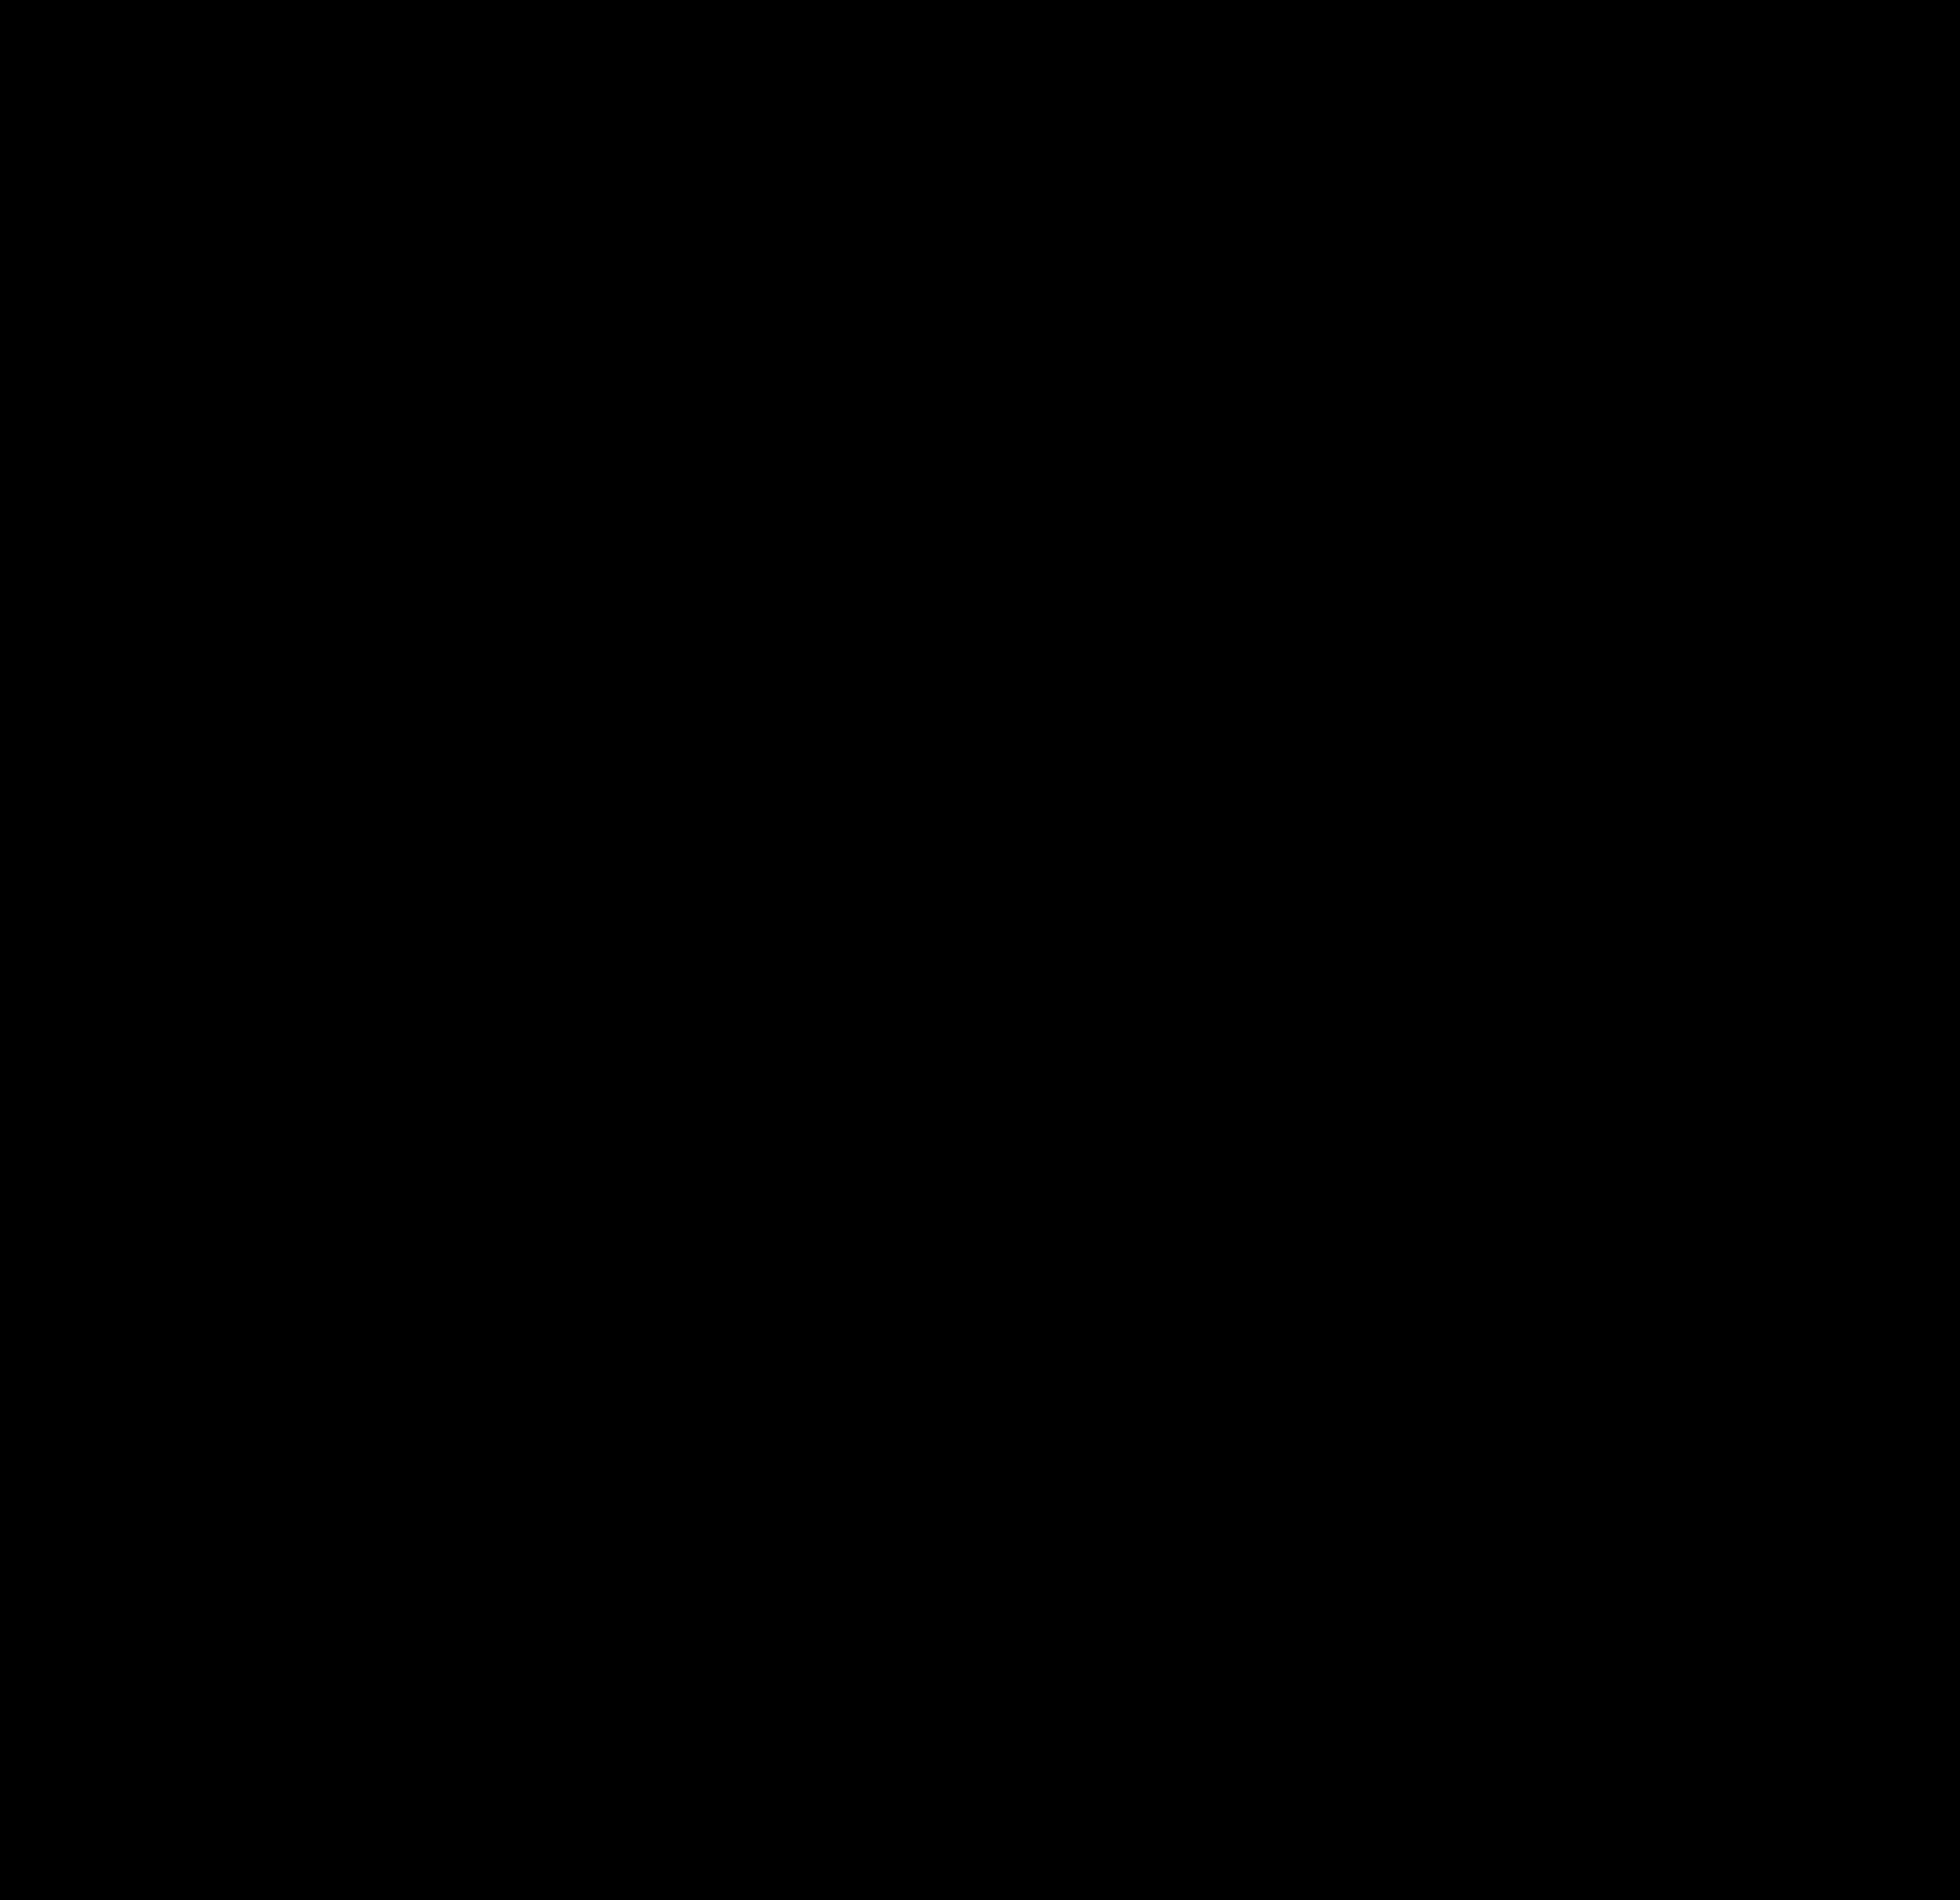 Unicorn Stencil Silhouette Vector Images | FreePatternsArea